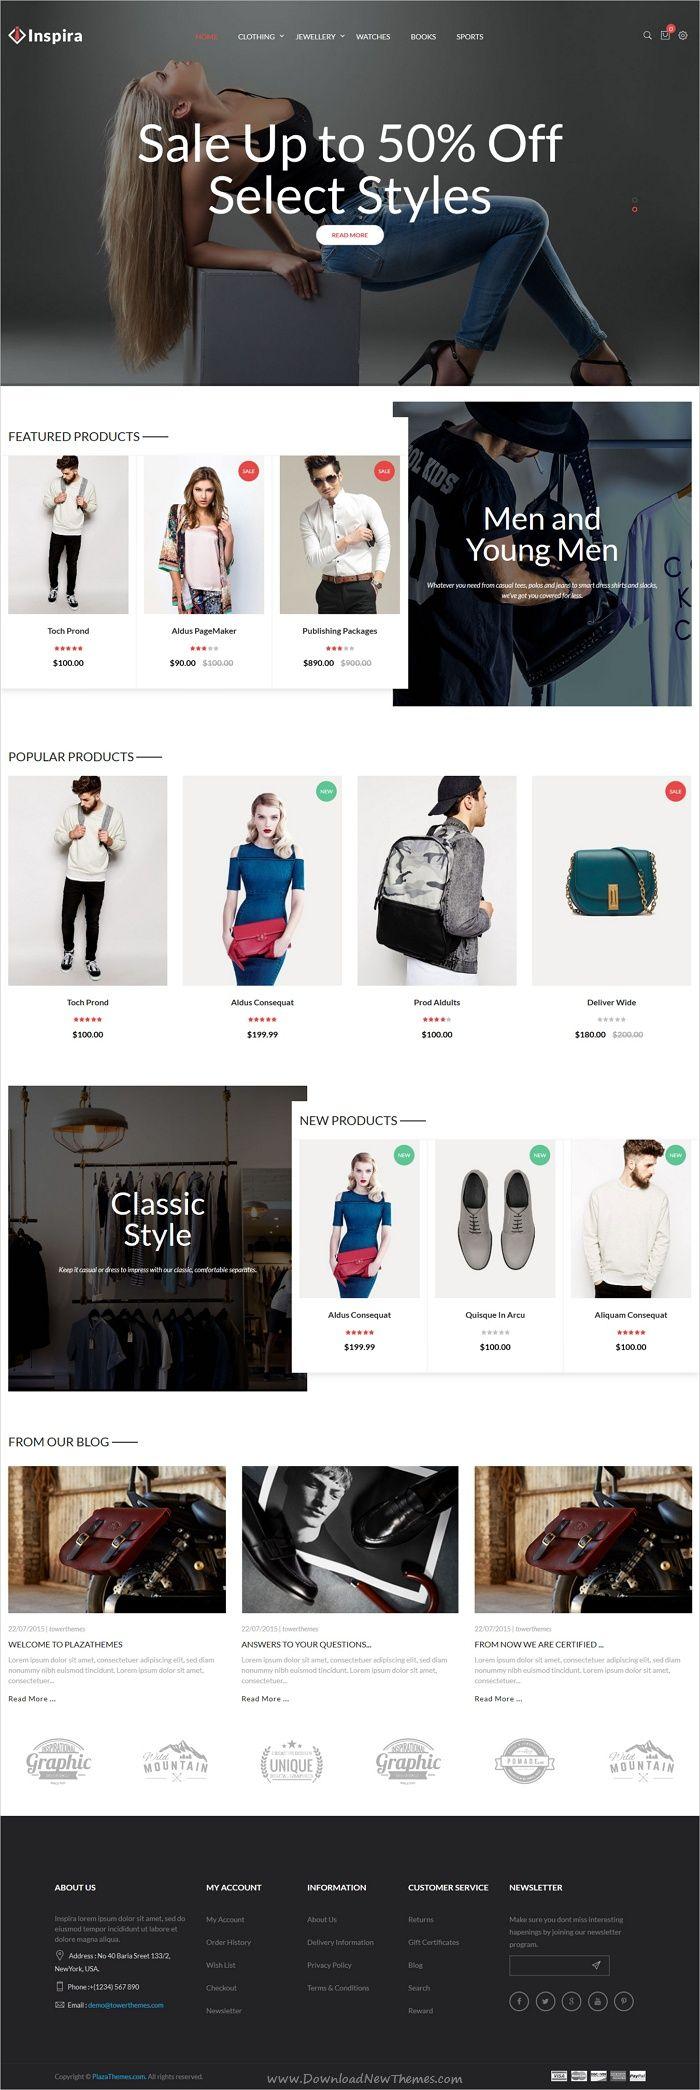 Inspira is a wonderful 6in1 responsive #Prestashop theme for stunning #fashion #store eCommerce websites download now➩ https://themeforest.net/item/inspira-multipurpose-responsive-prestashop-theme/19355530?ref=Datasata